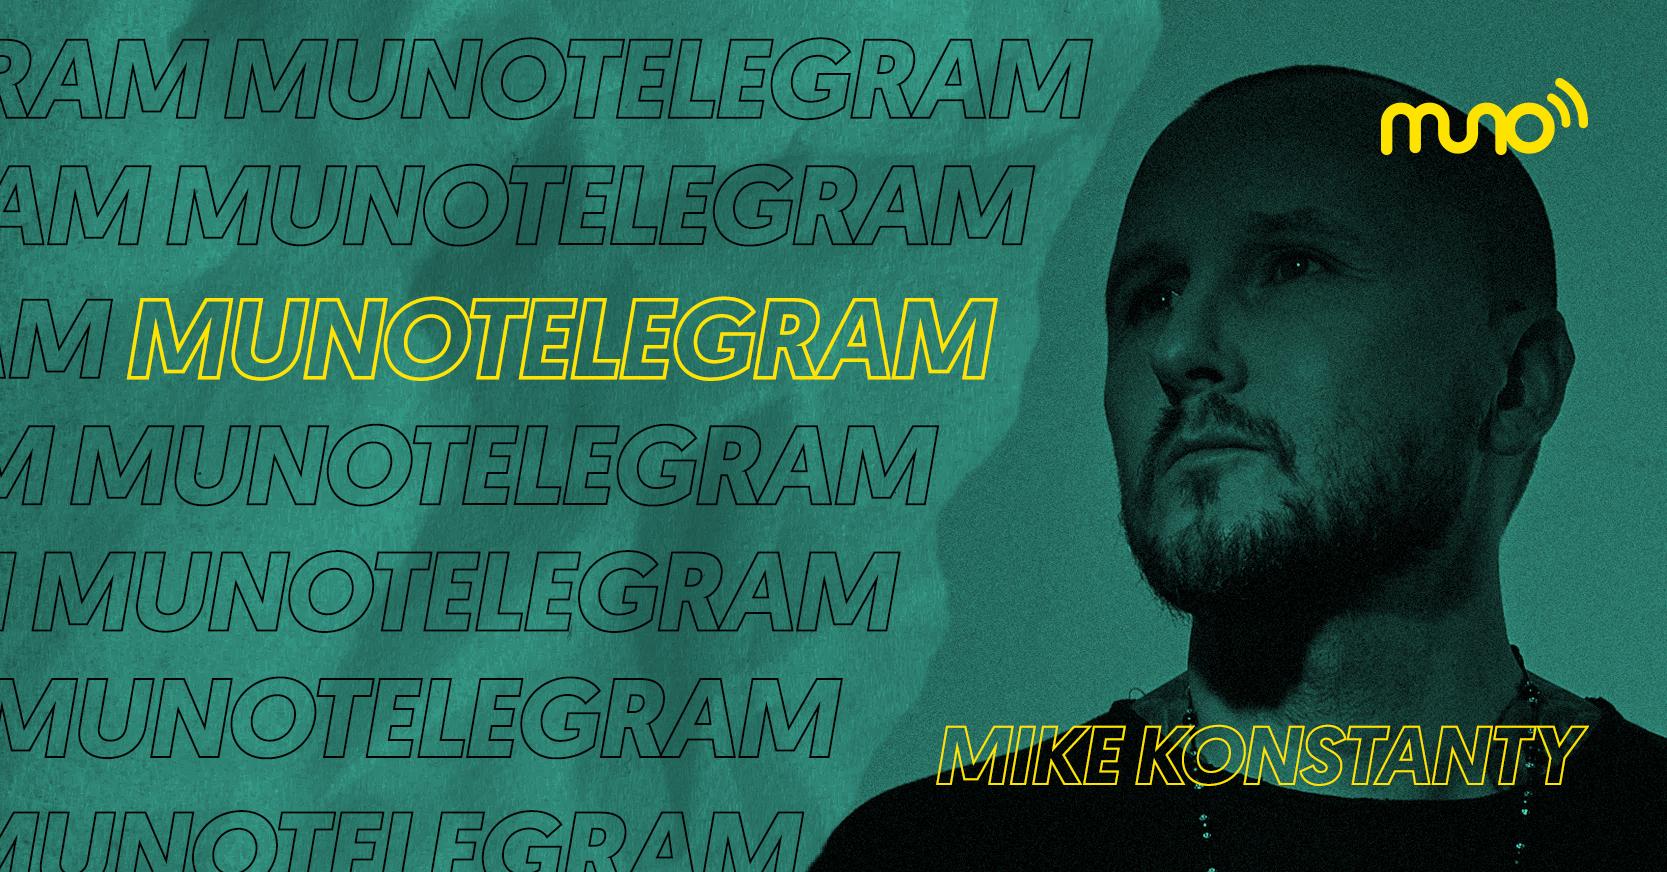 Muno TeleGram: Mike Konstanty